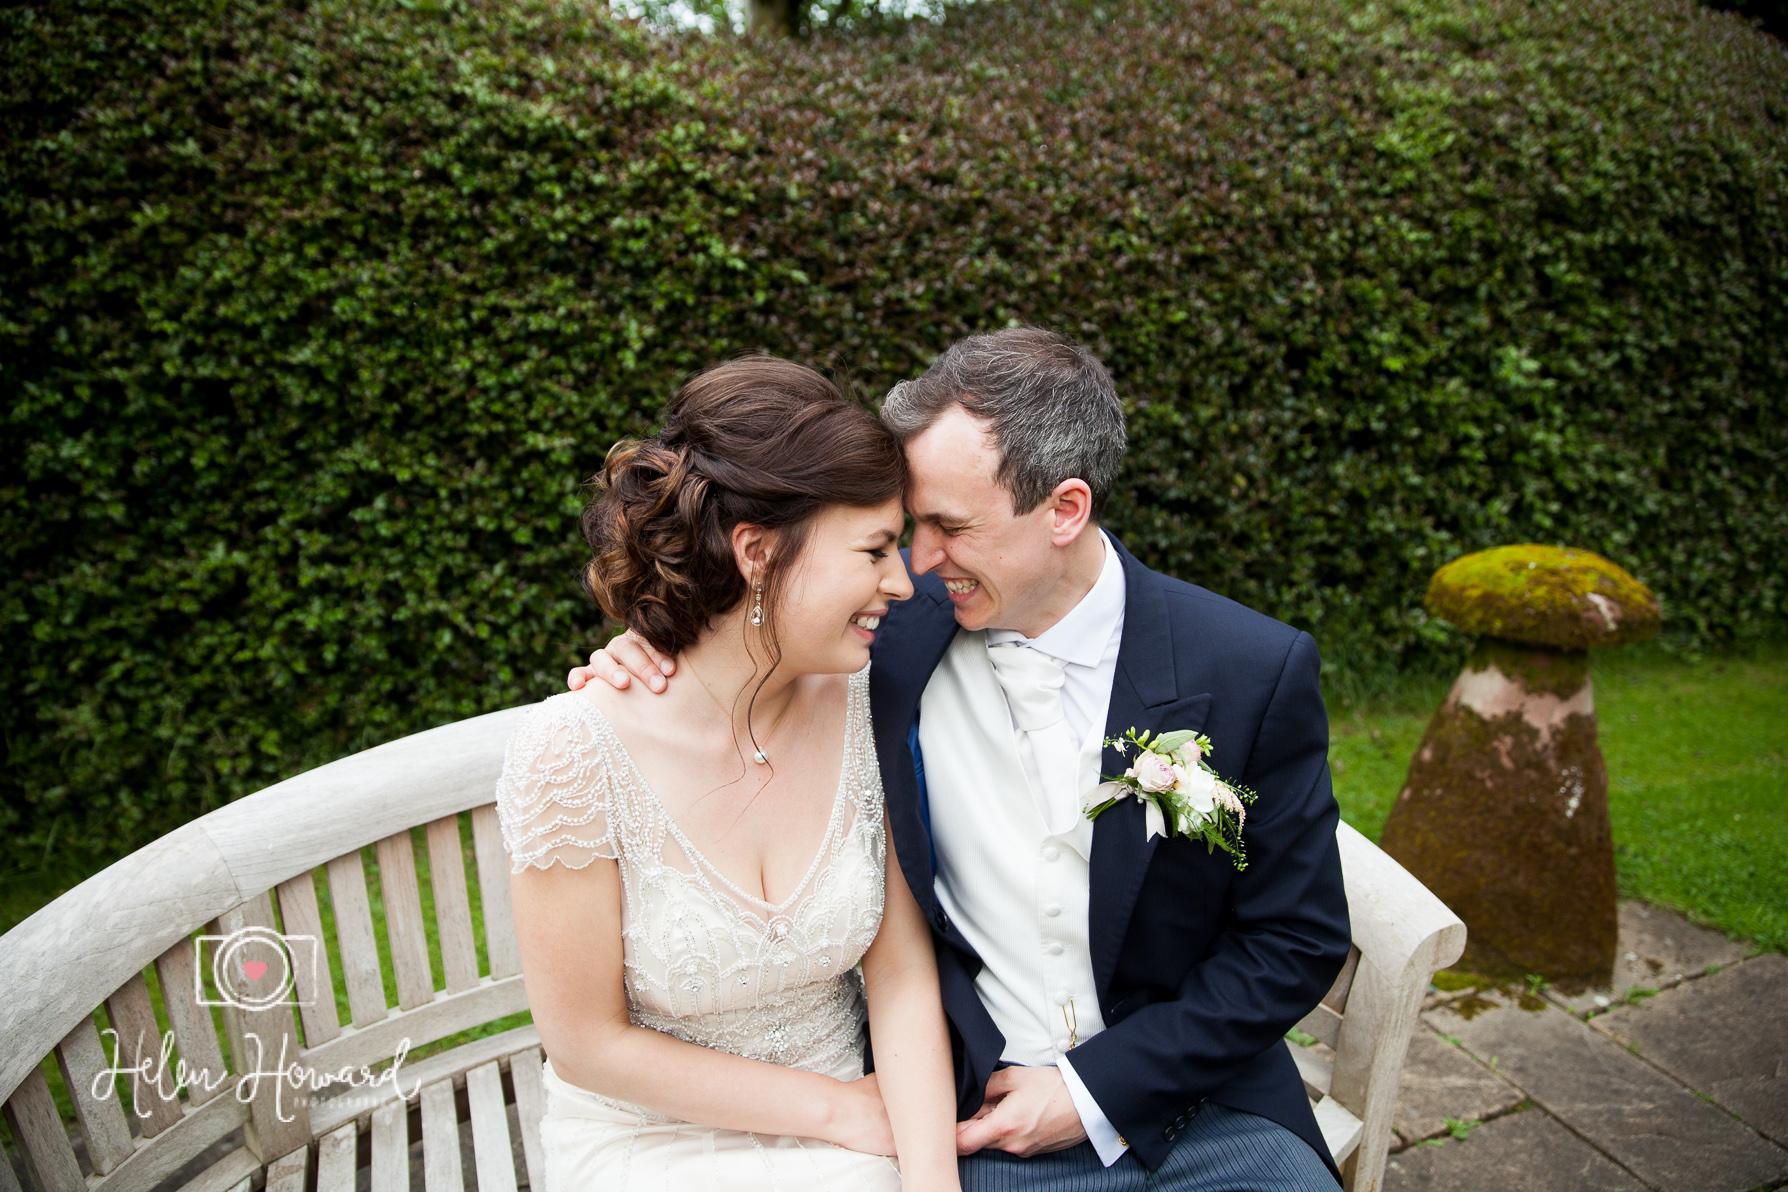 Helen Howard Photography Packington Moor Wedding-109.jpg